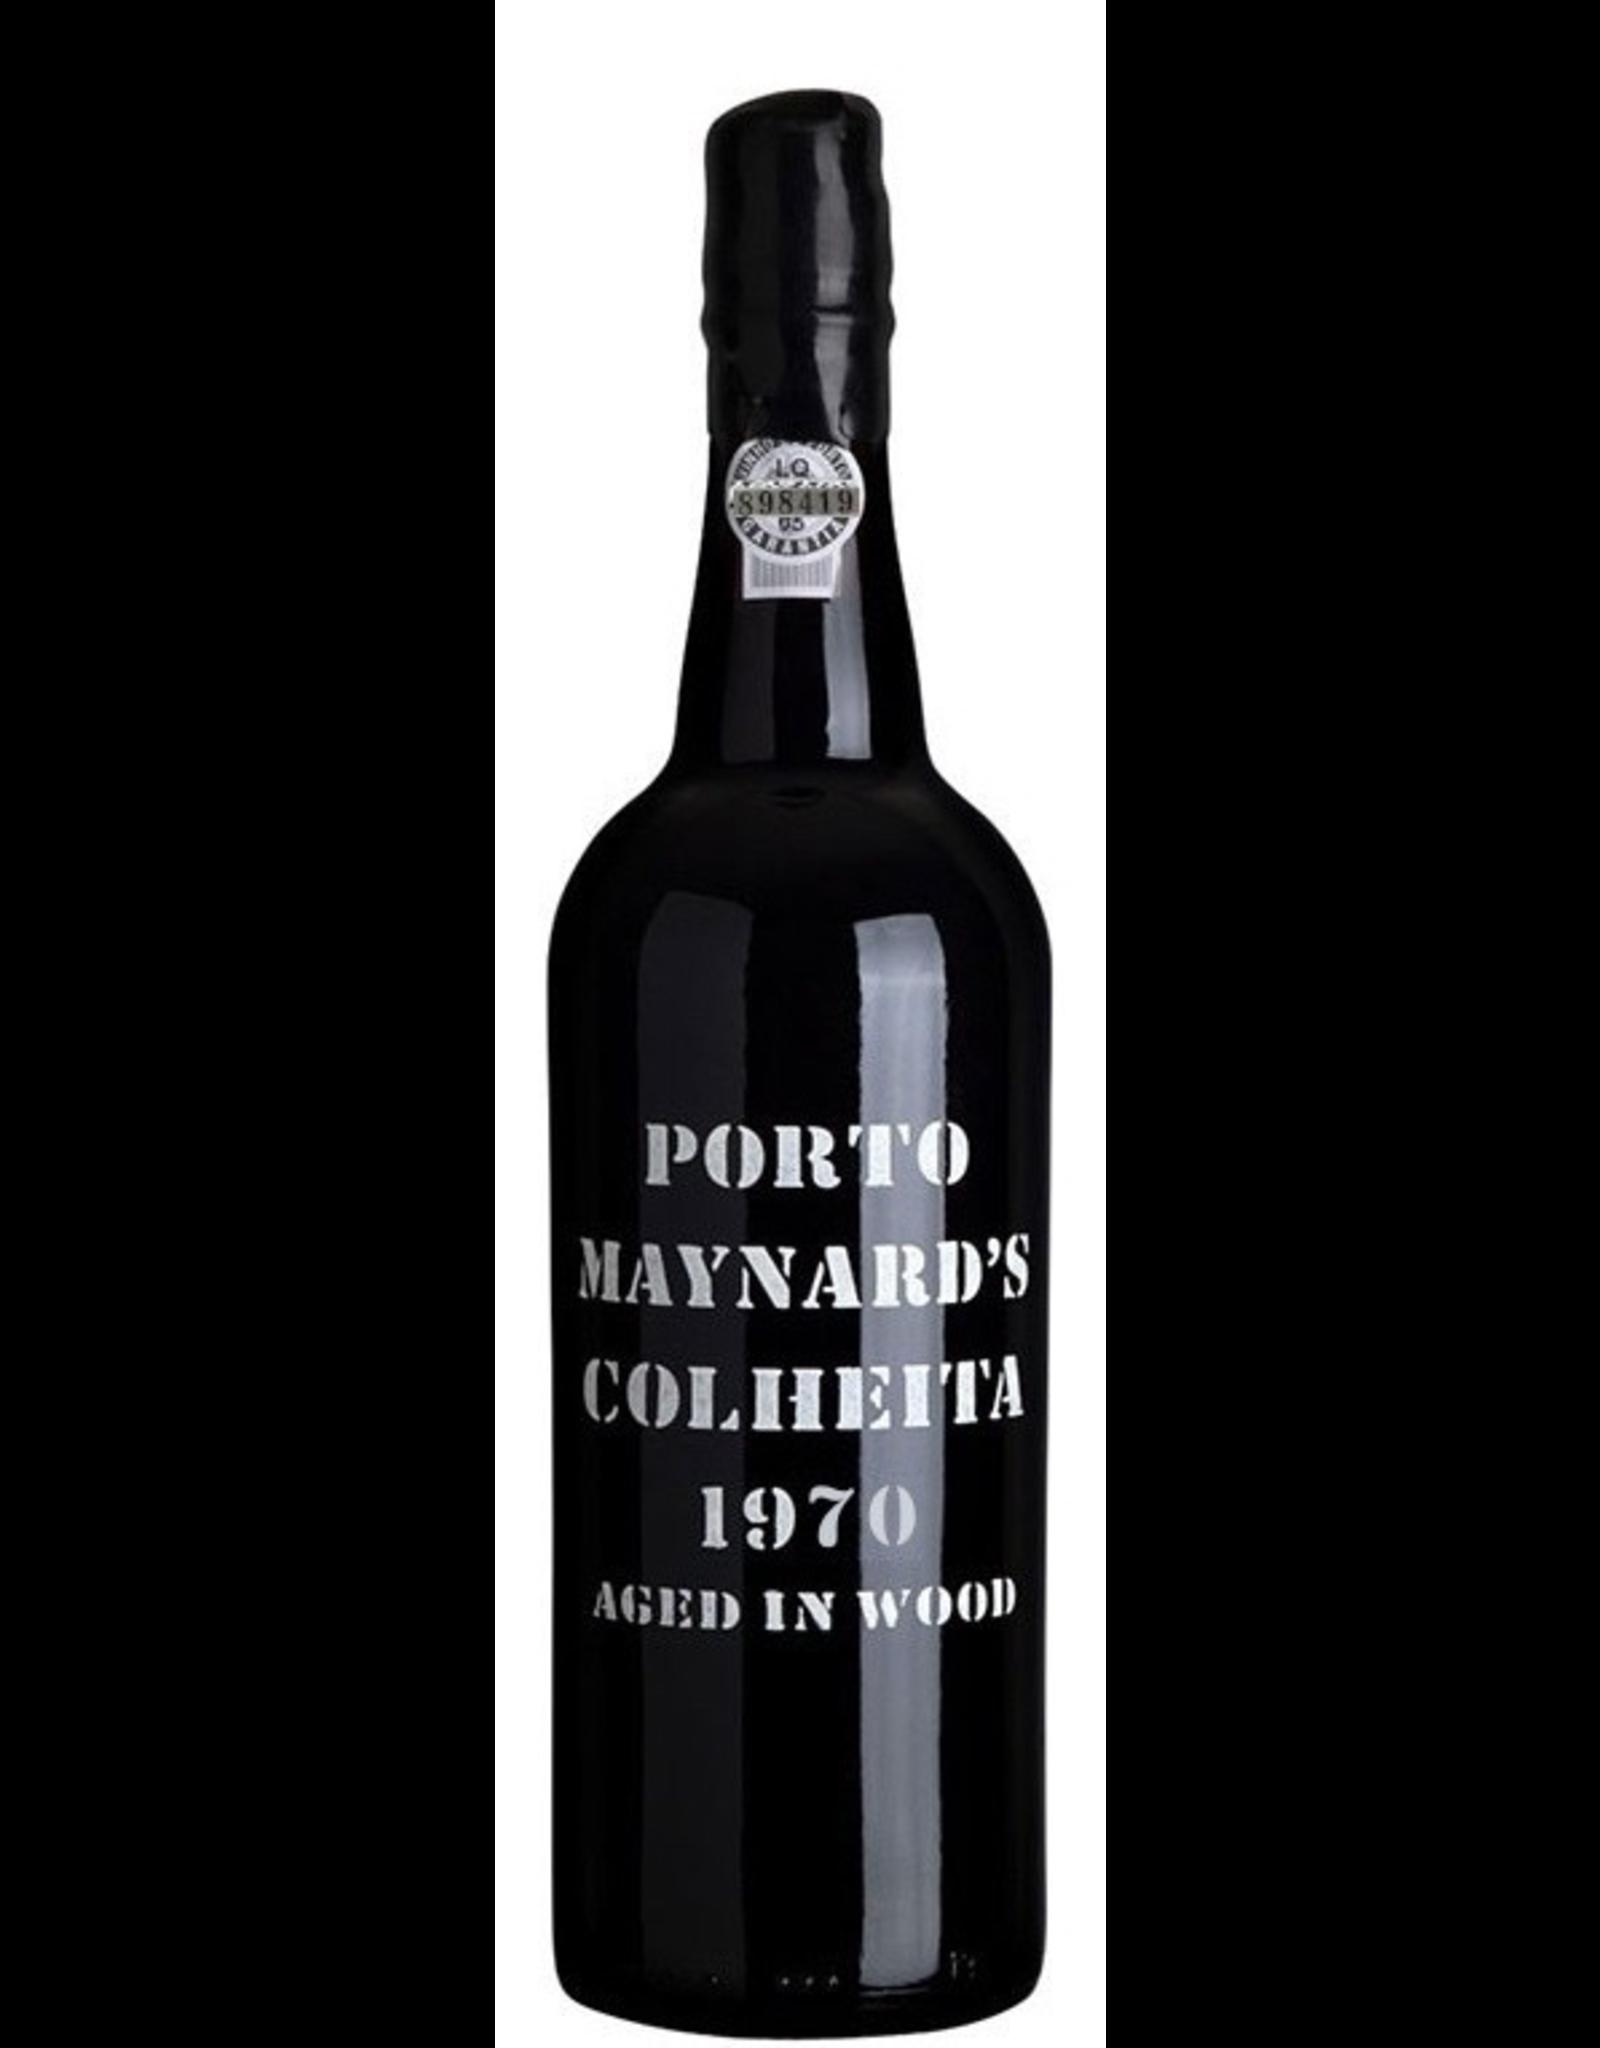 Port 1970, Maynard's Vintage Colheita Porto, Port, Douro Valley, Oporto, Portugal, % Alc, CTnr